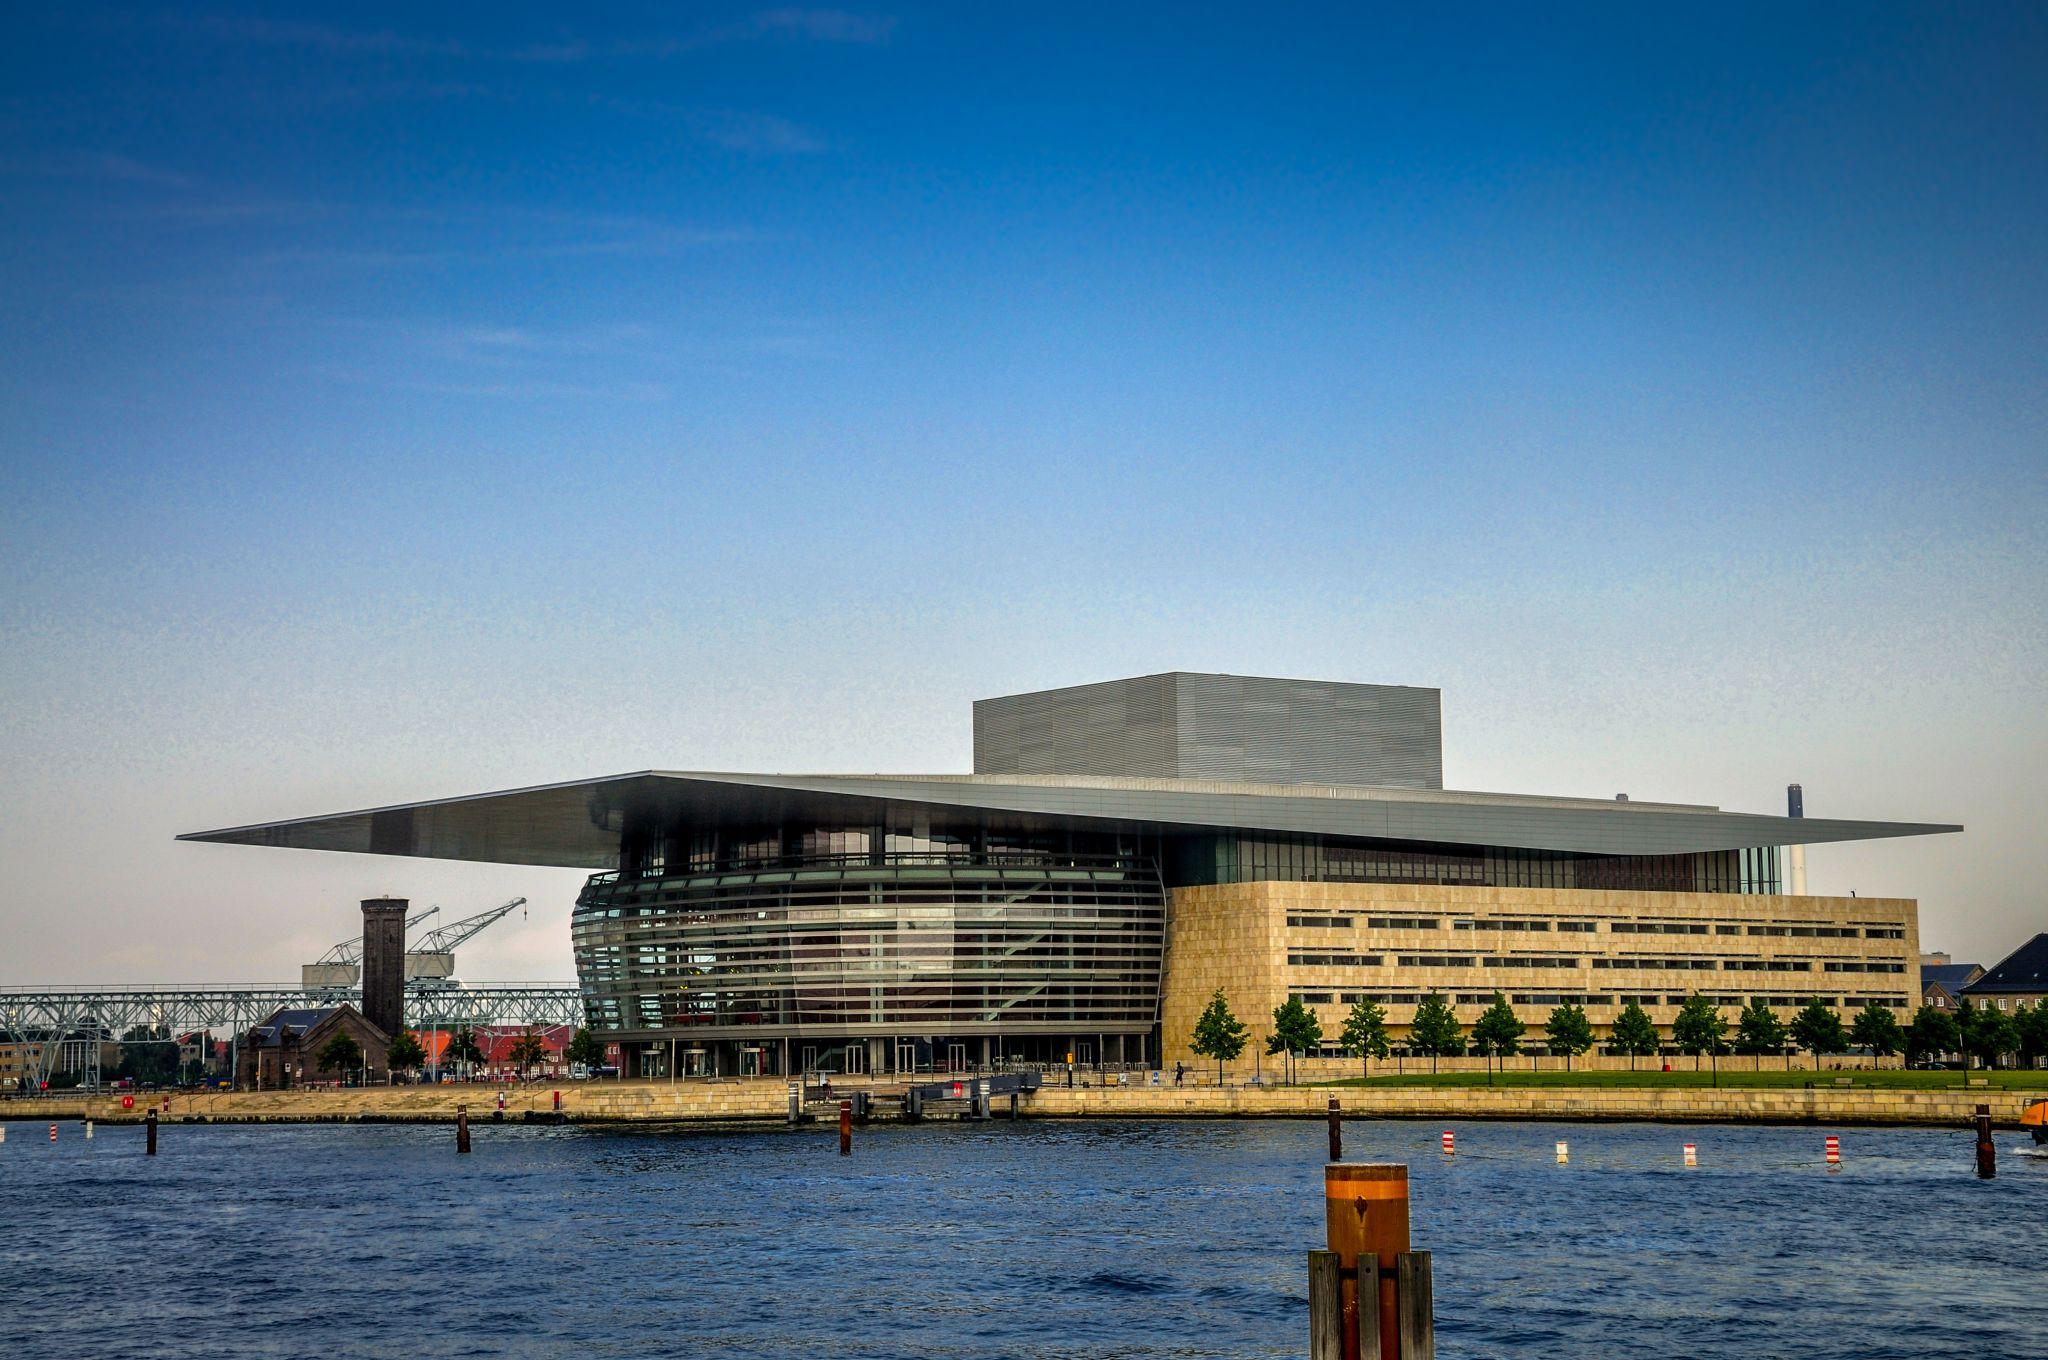 Copenhagen's Opera House, Denmark